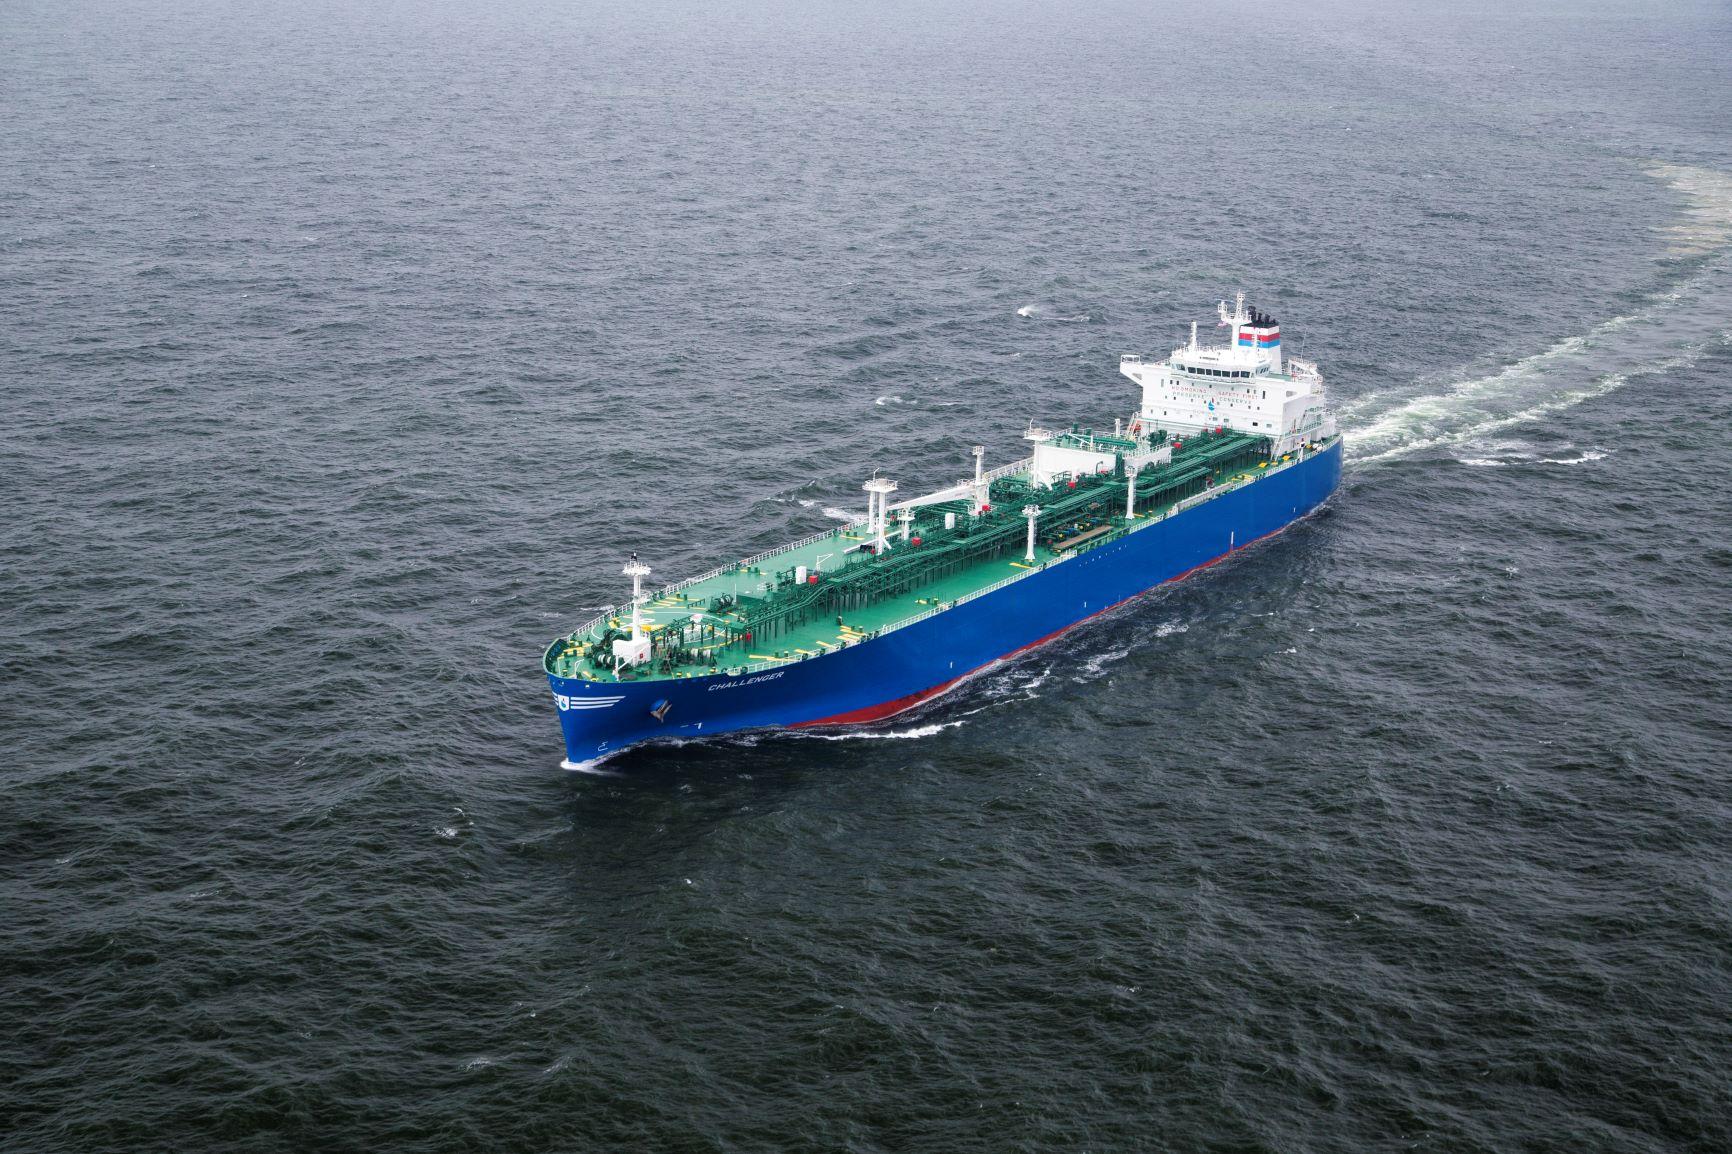 Norway's Kongsberg Digital inks contract with Dorian LPG for its fleet of LPG carriers